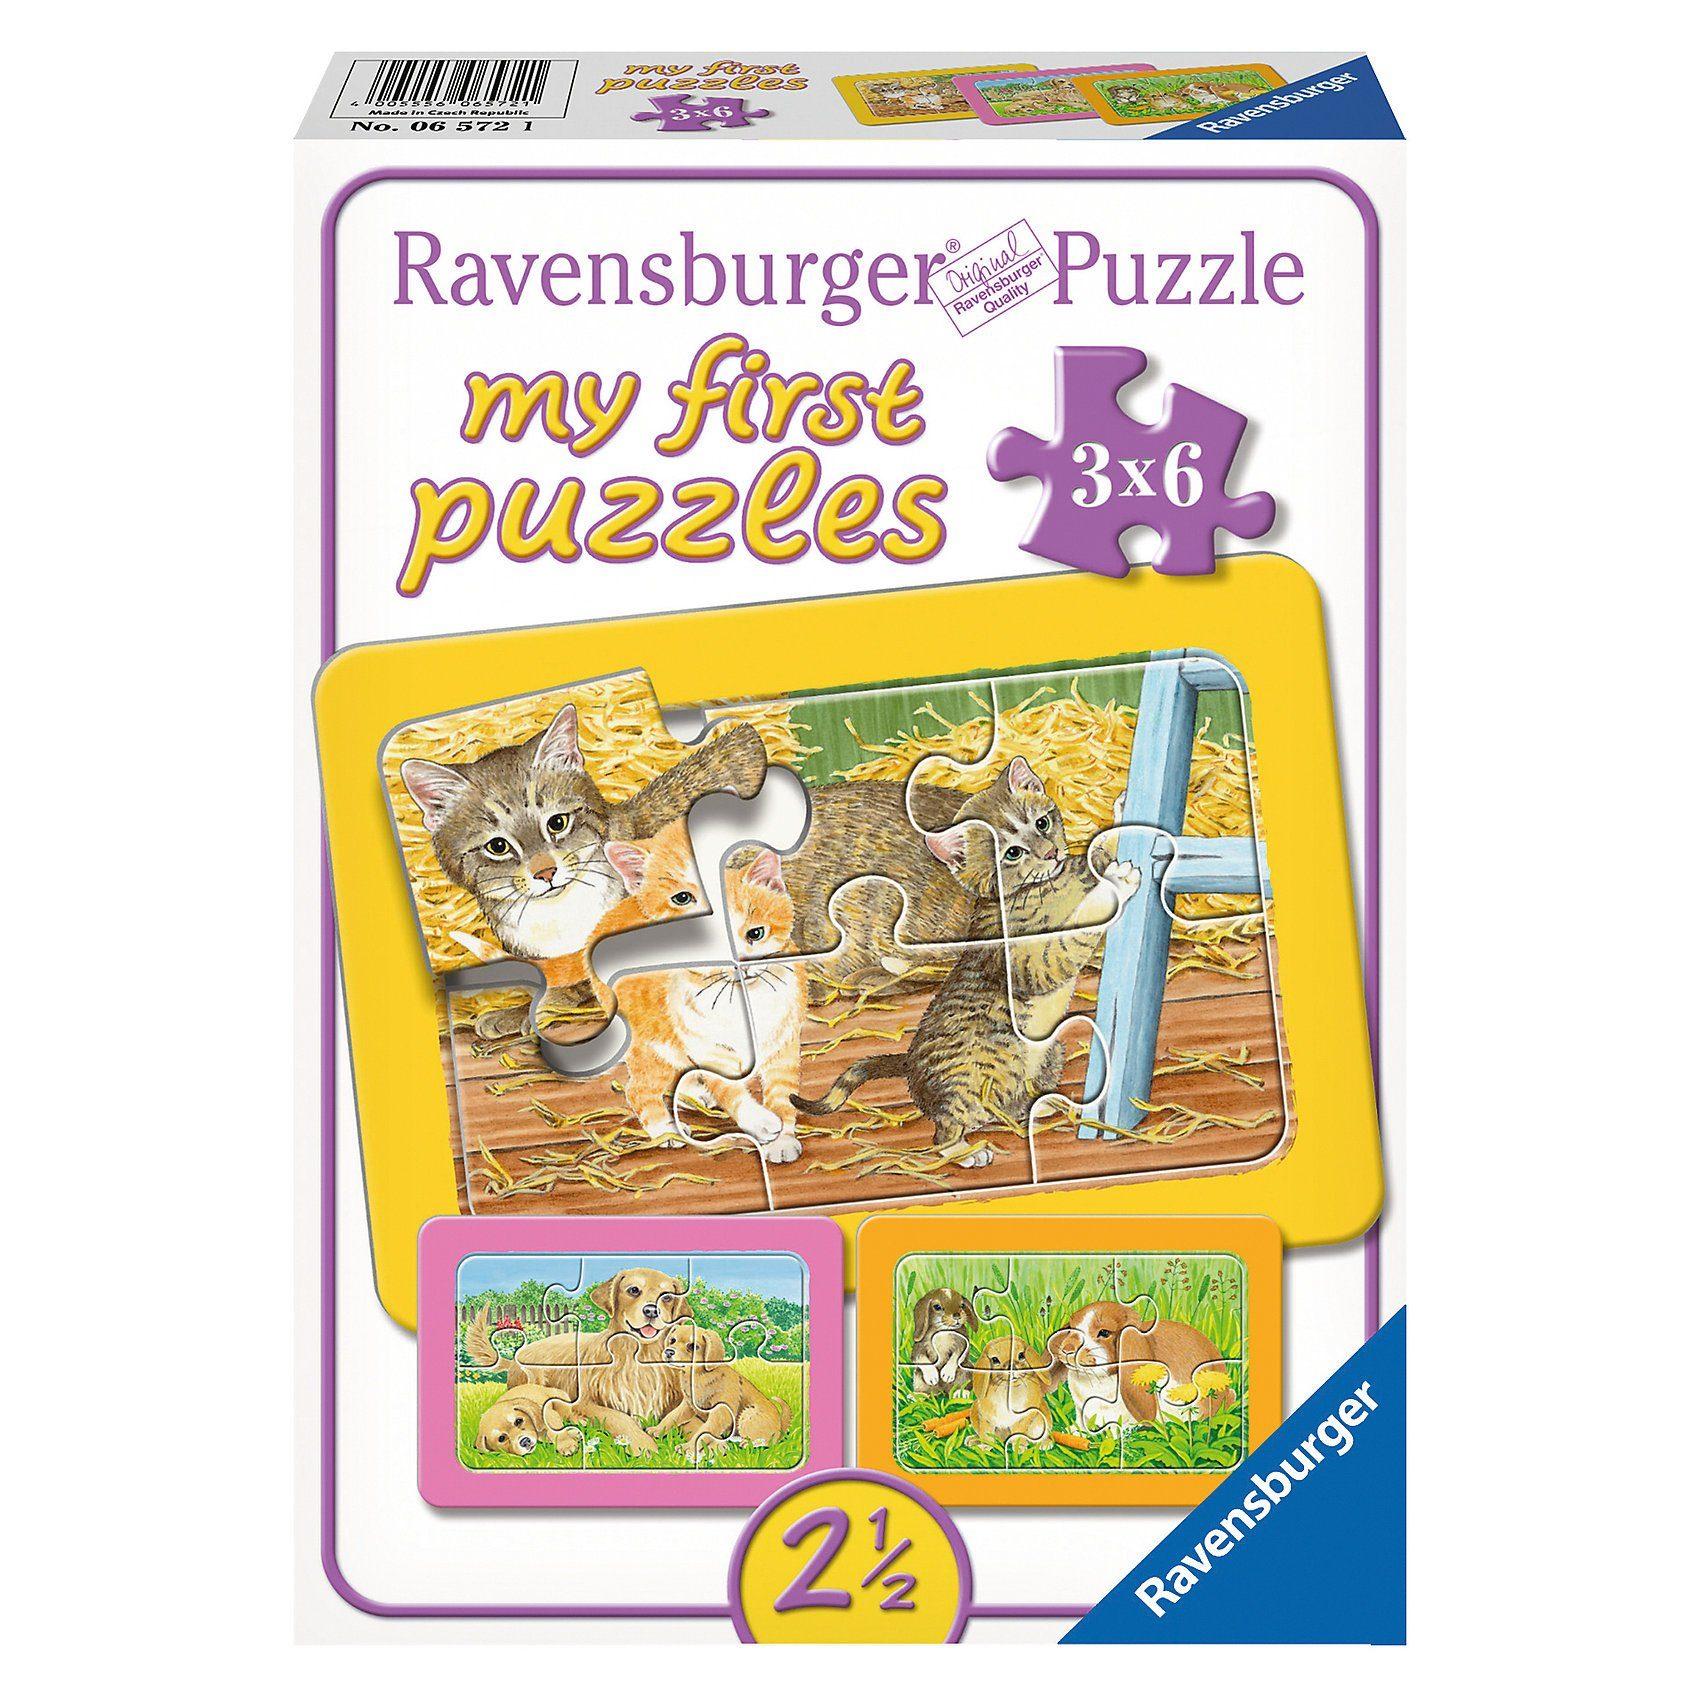 Ravensburger My first Puzzles - Rahmenpuzzle Liebste Haustiere